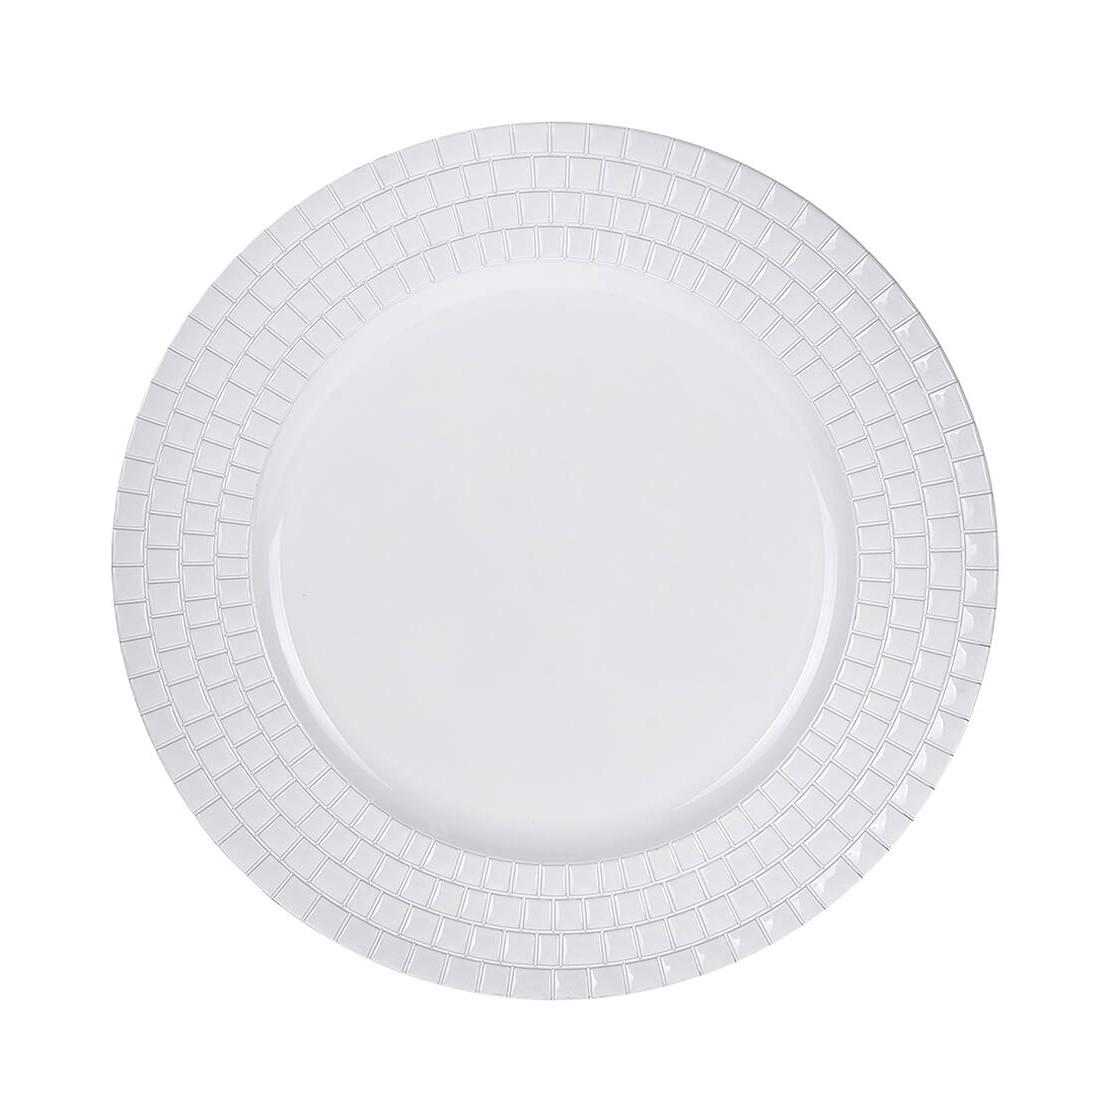 Sousplat Redondo Plastico 33cm Branco 43697-008 - G Presentes